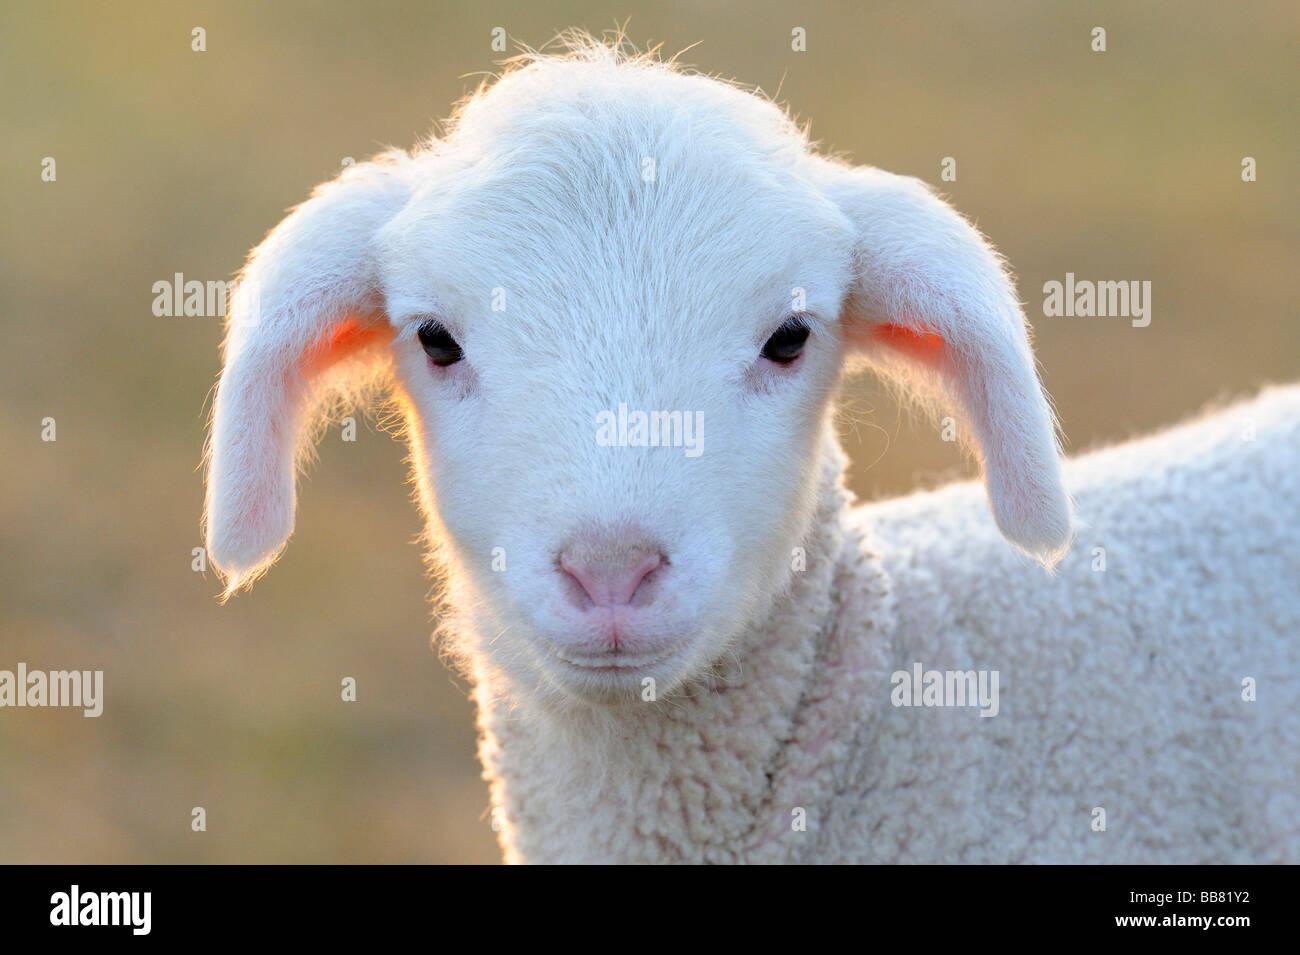 Domestic sheep, merino sheep, lamb, portrait - Stock Image